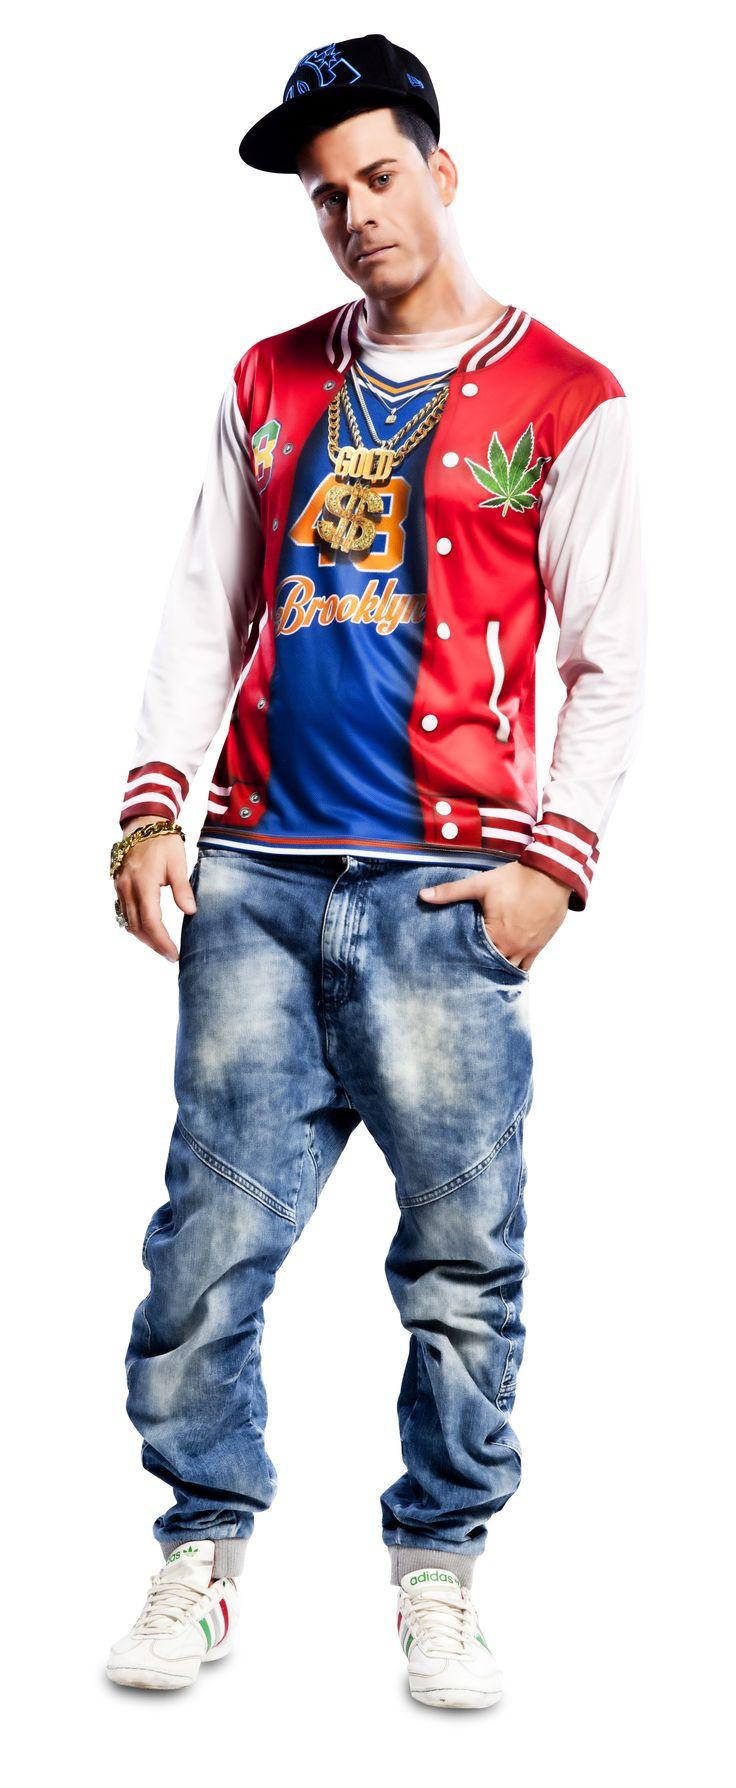 Disfraz Rapper. #Rapero #Music #Dollar #Original #Costume #BeOther